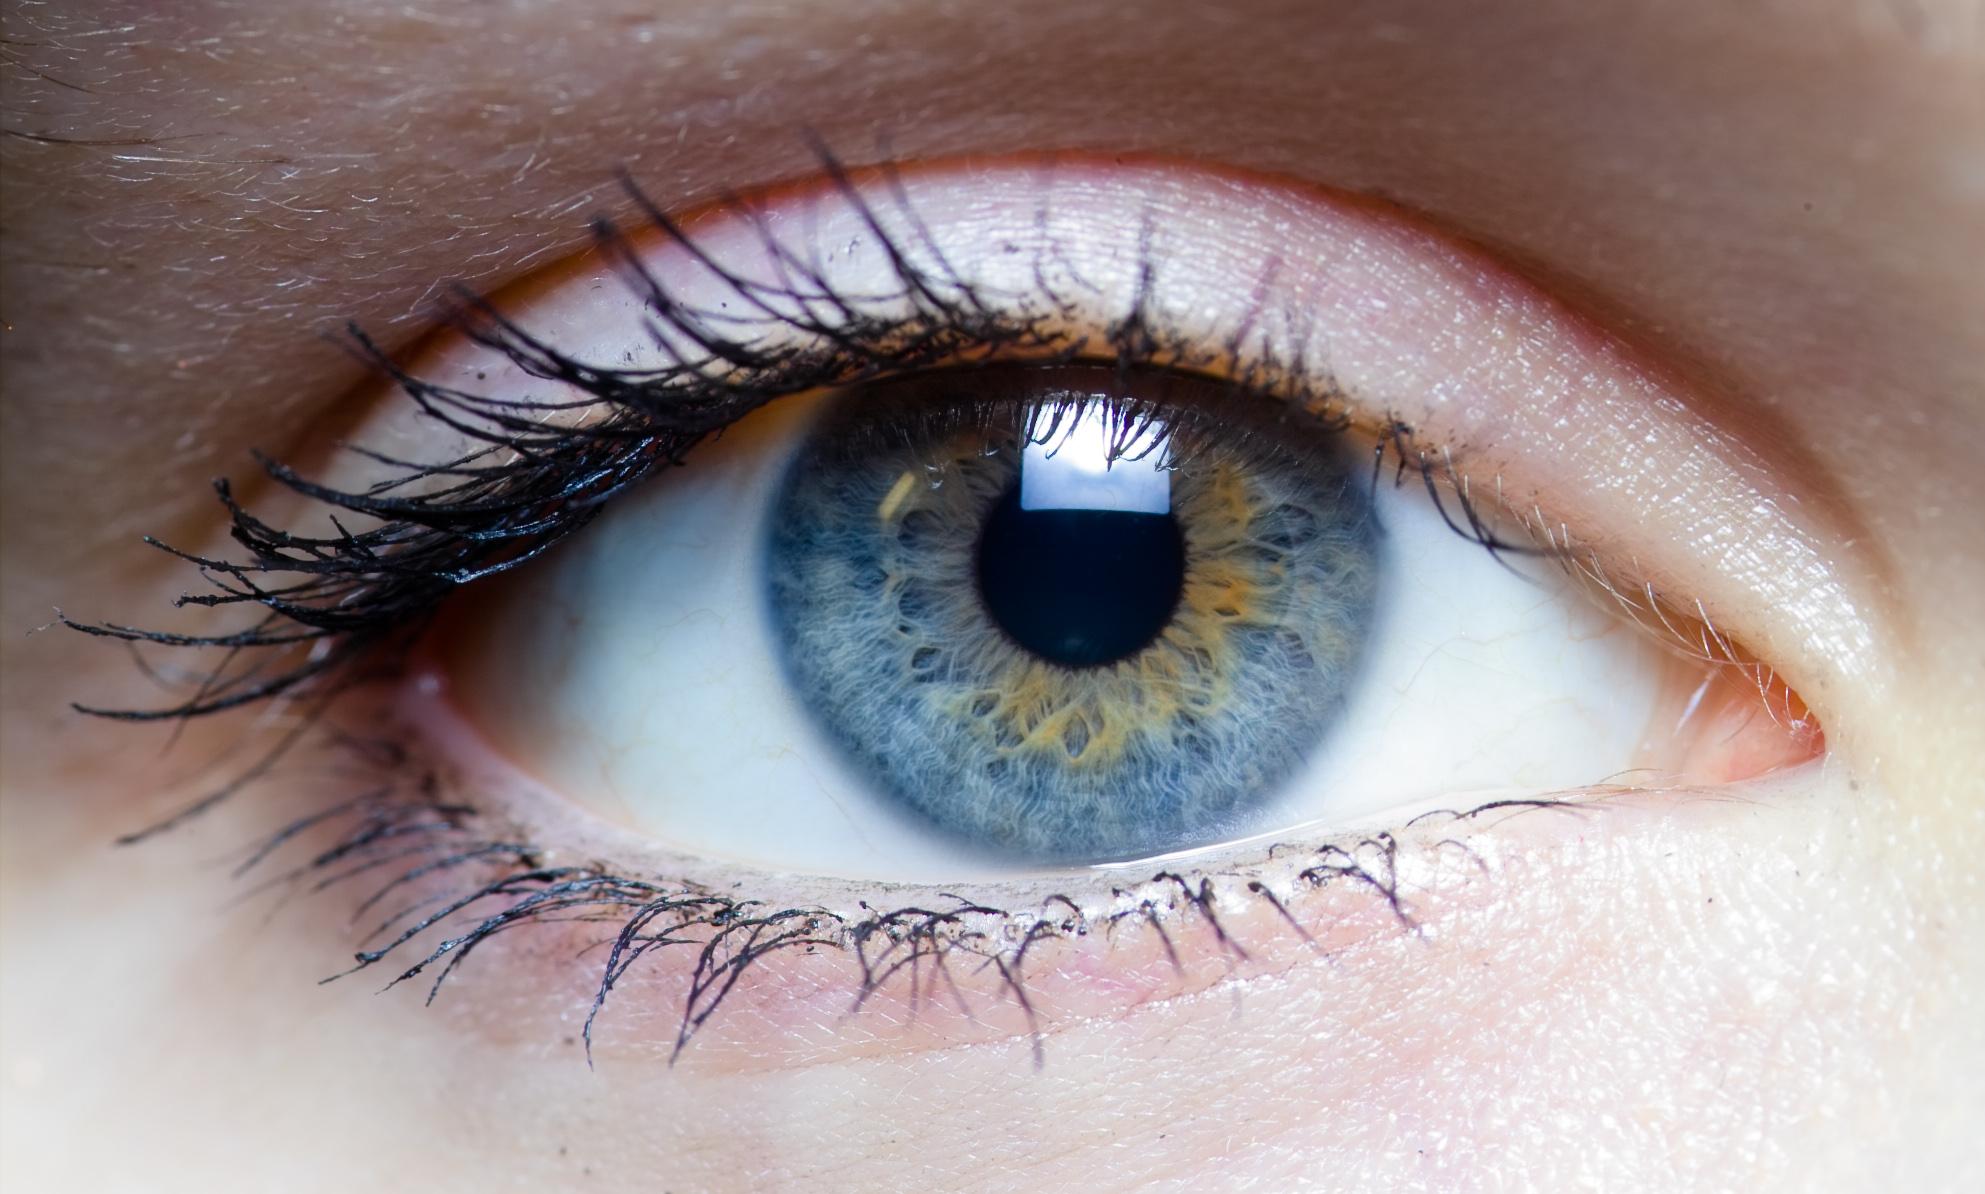 off-label marketing of eye drug